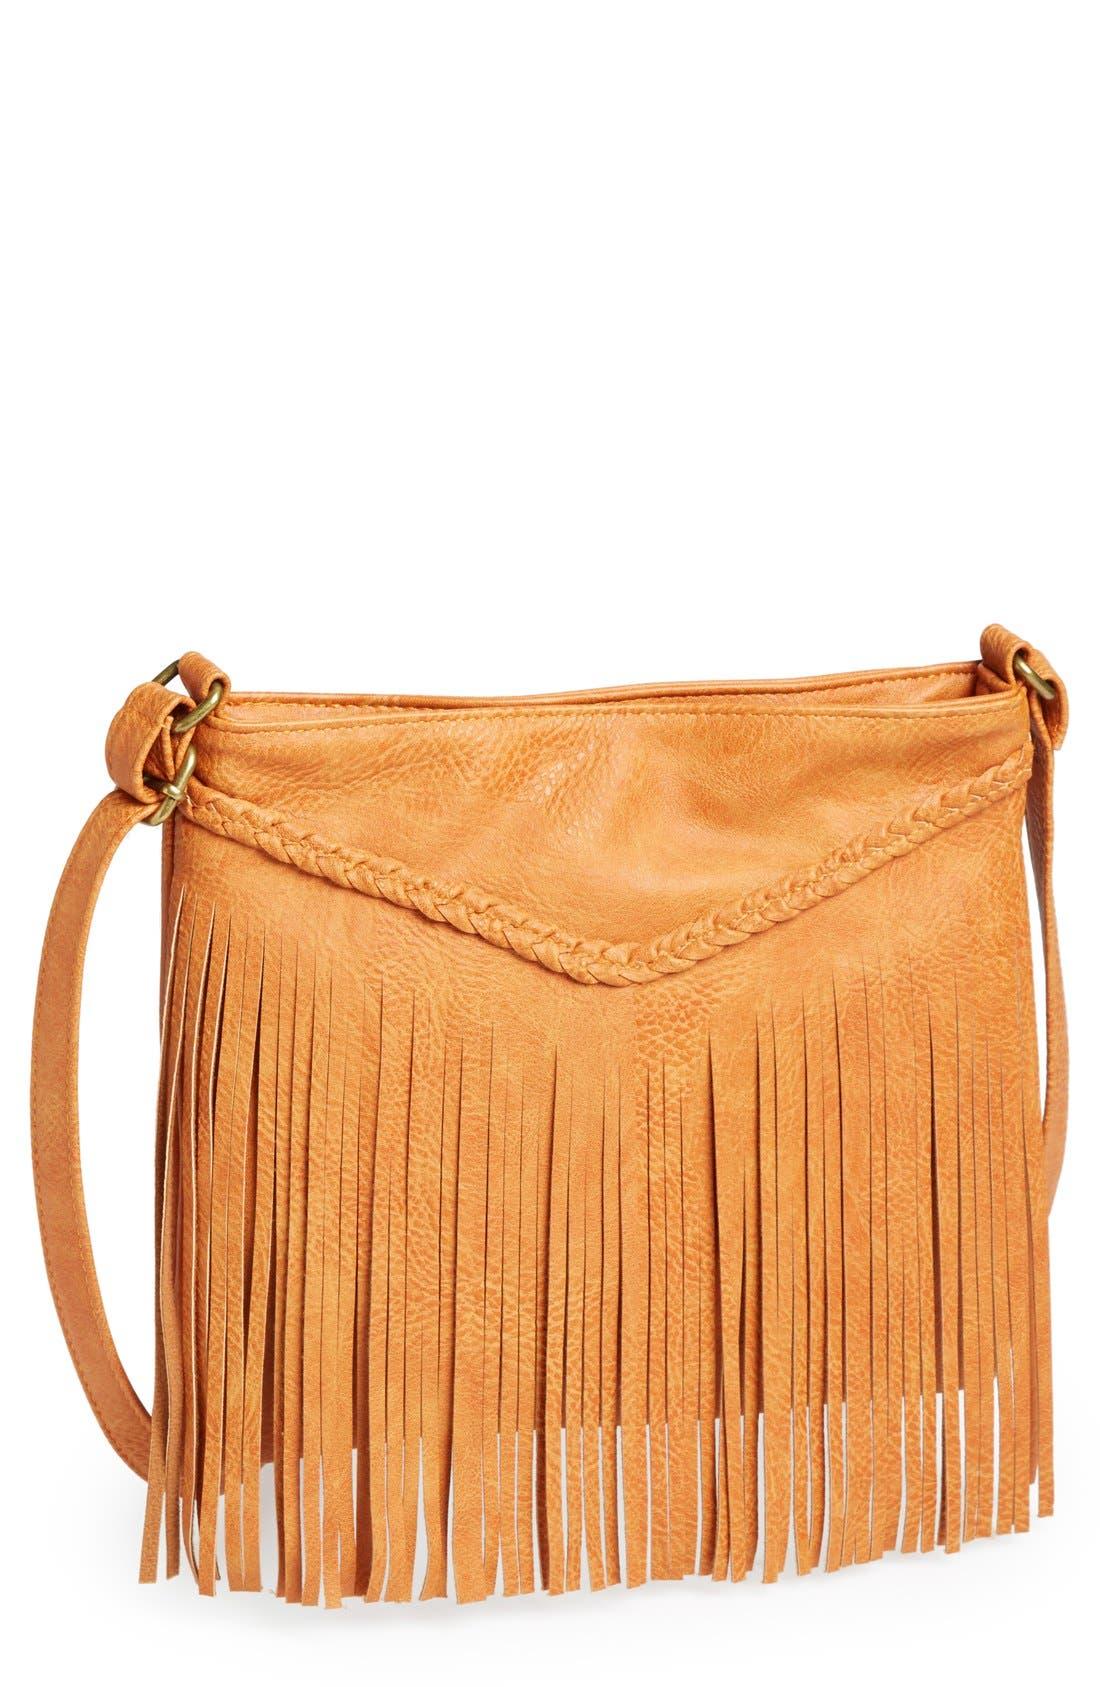 Alternate Image 1 Selected - Lulu Fringe Small Convertible Crossbody Bag (Juniors)